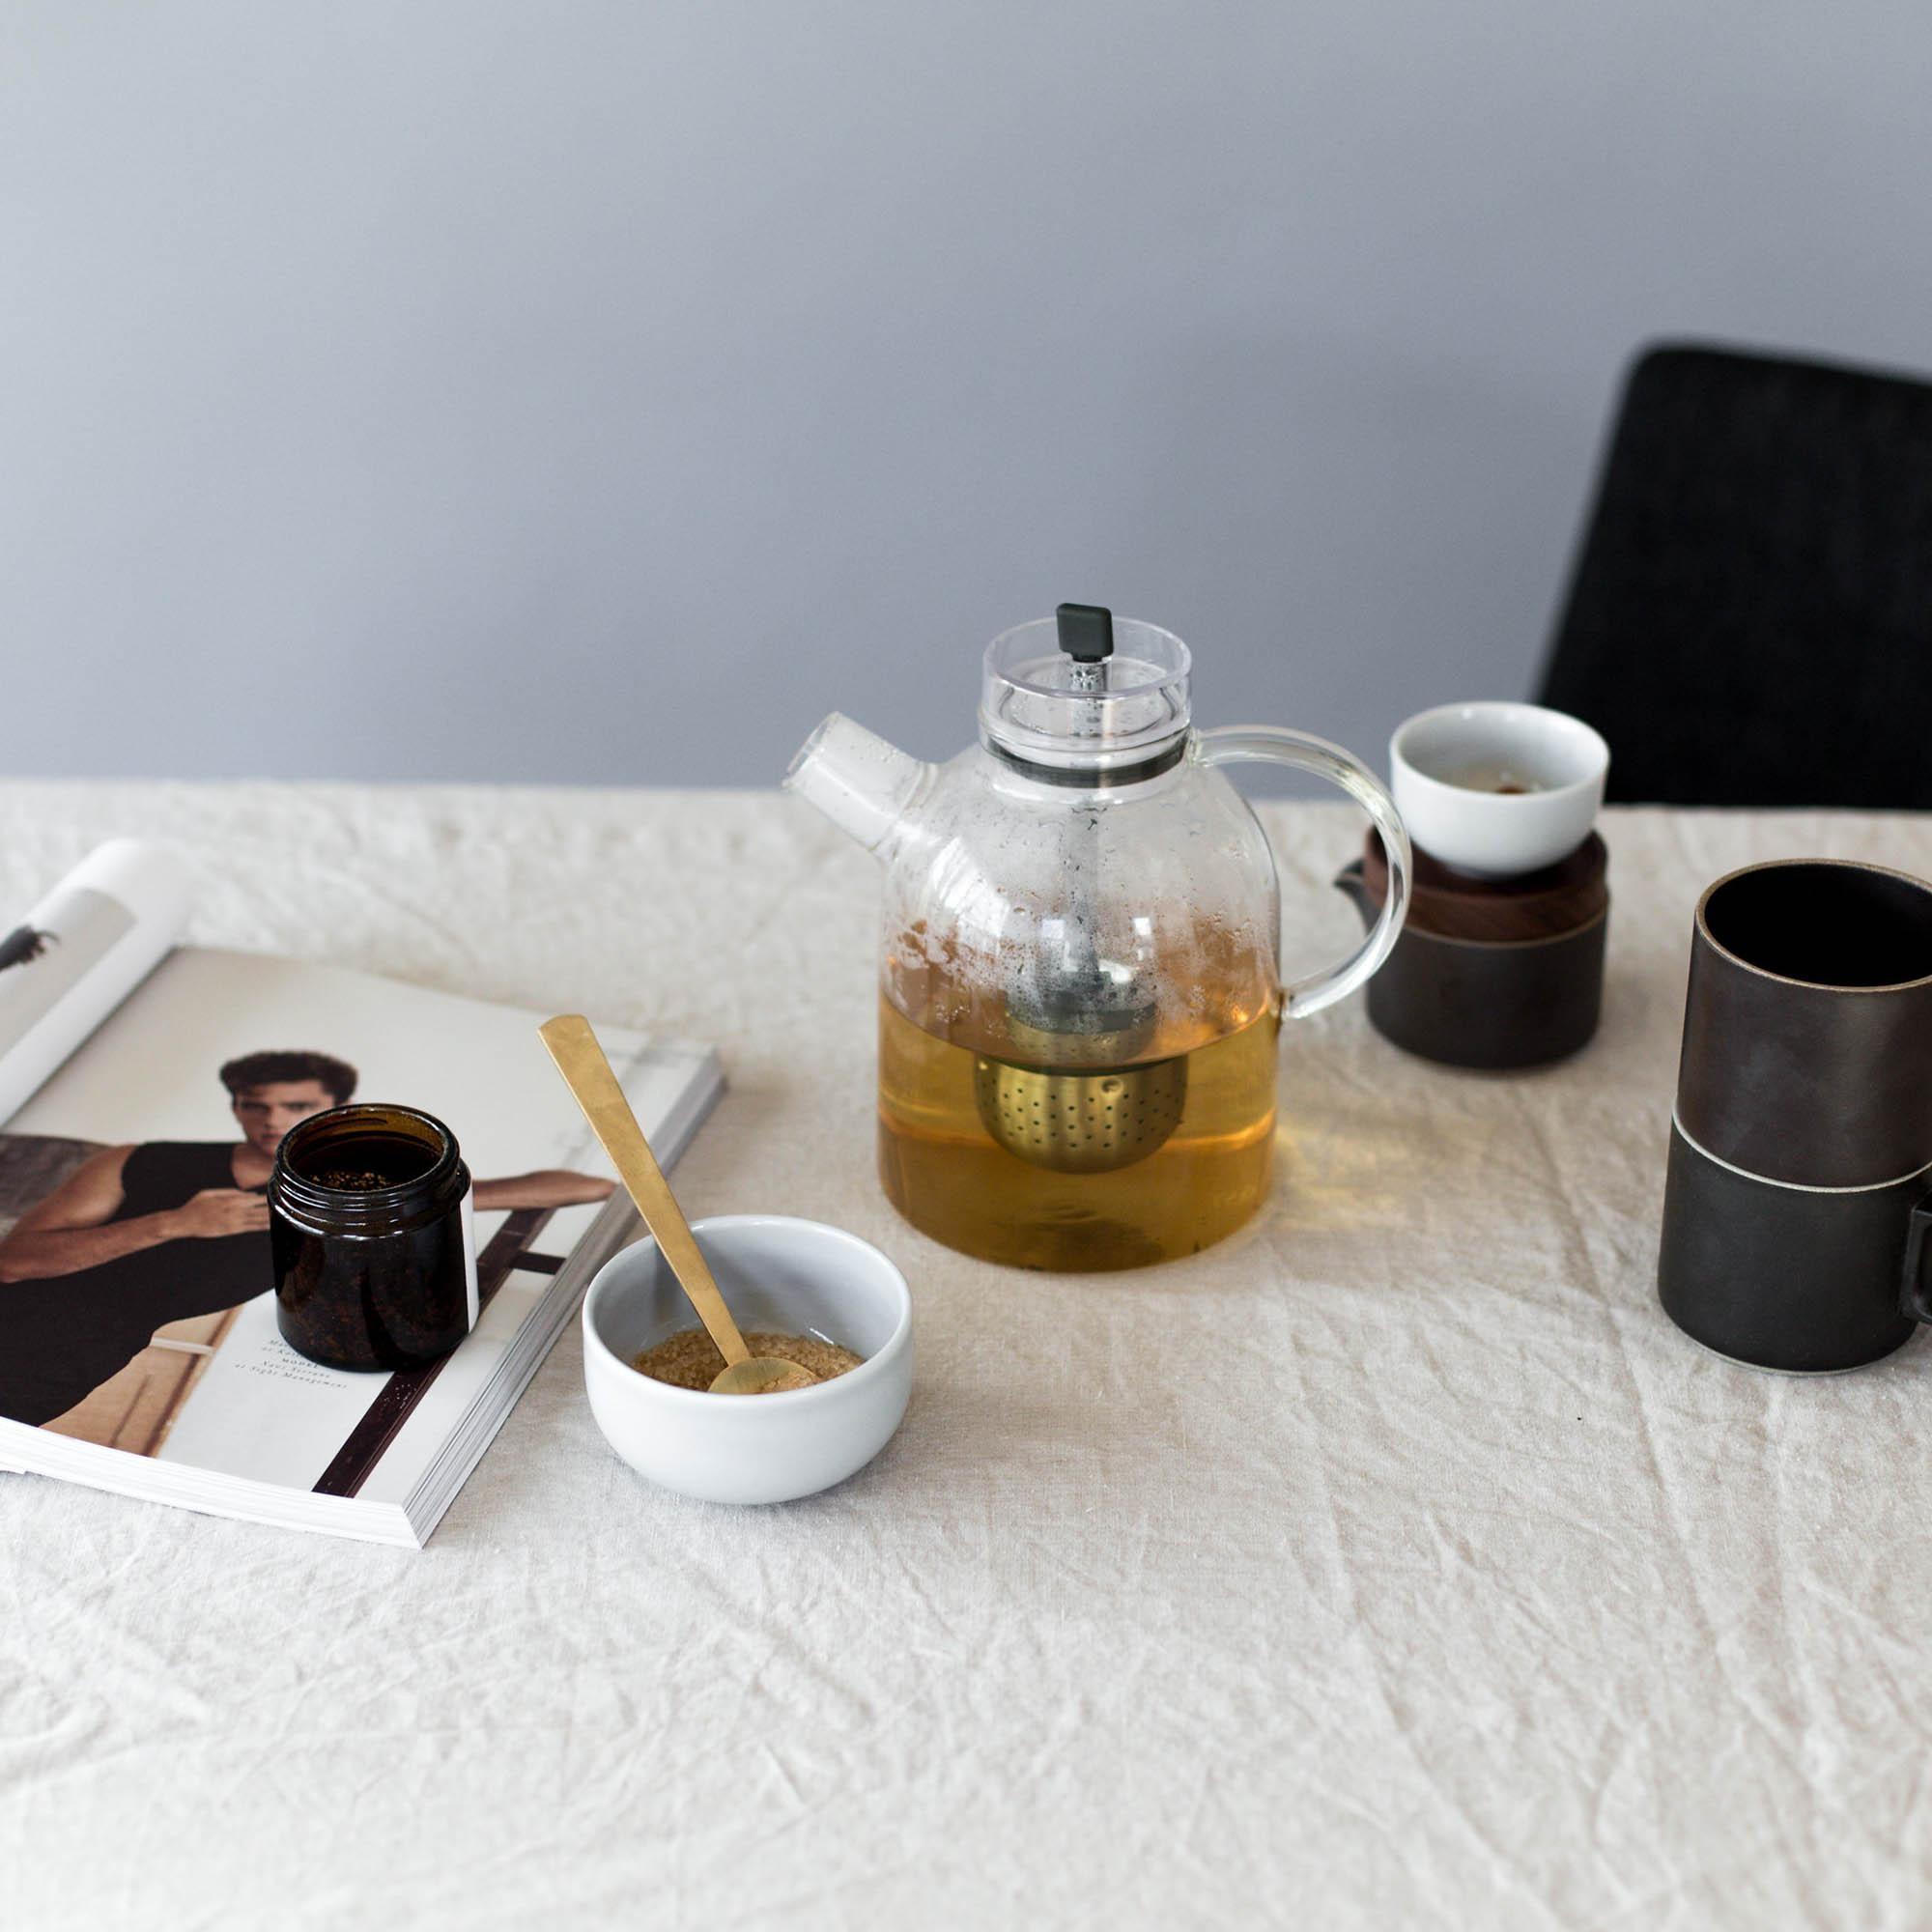 menu kettle teekanne 1 5l ambientedirect. Black Bedroom Furniture Sets. Home Design Ideas